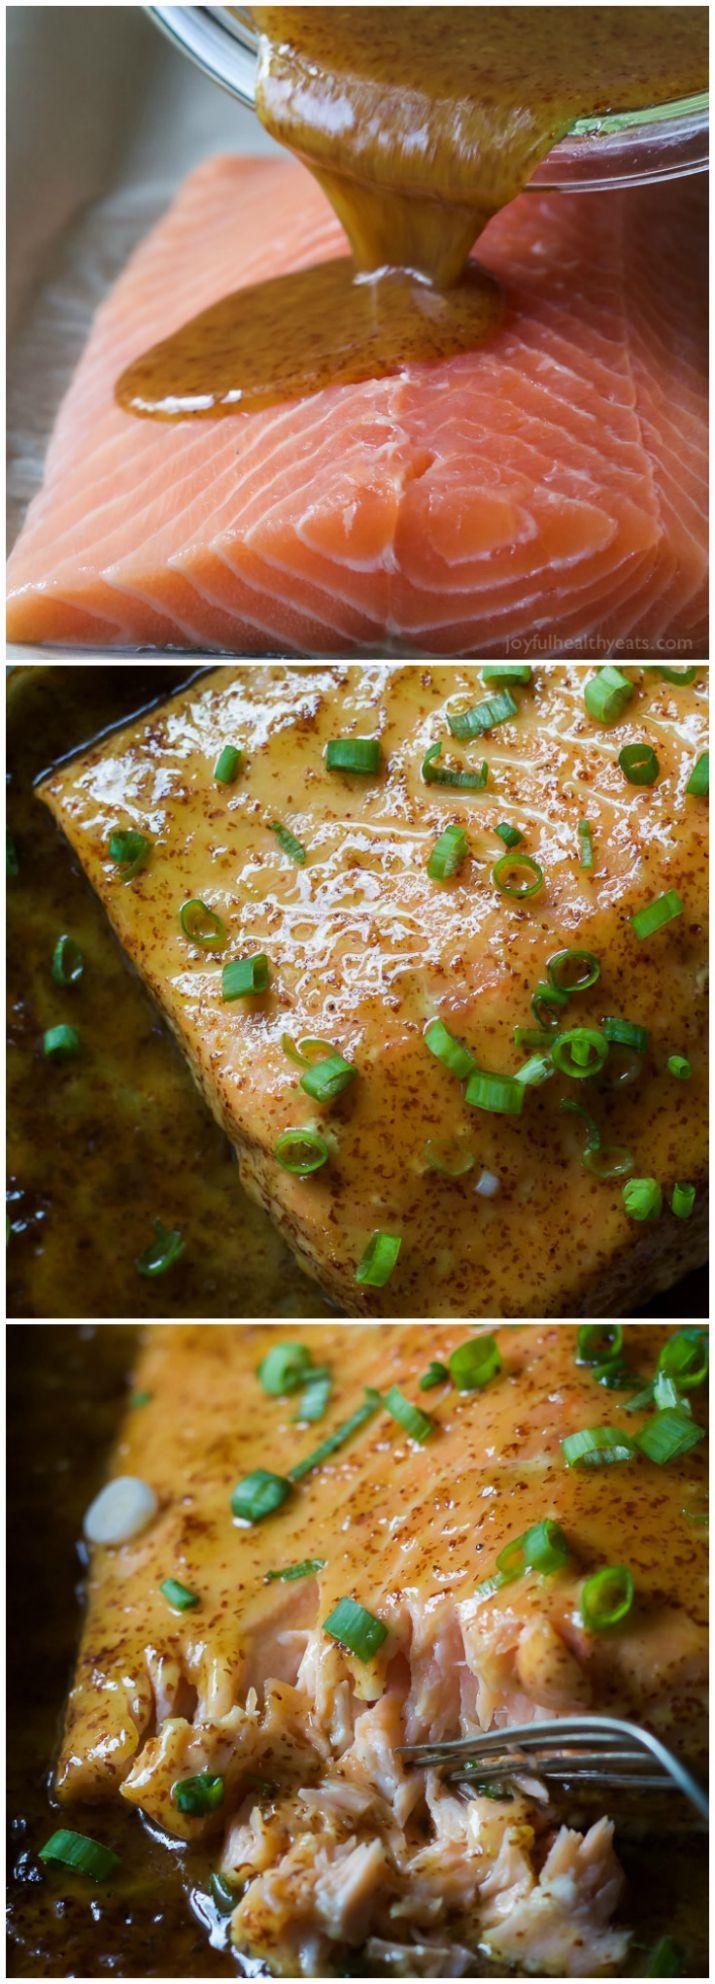 Photo of Dijon Maple Glazed Salmon | Quick and Easy Glazed Salmon Recipe